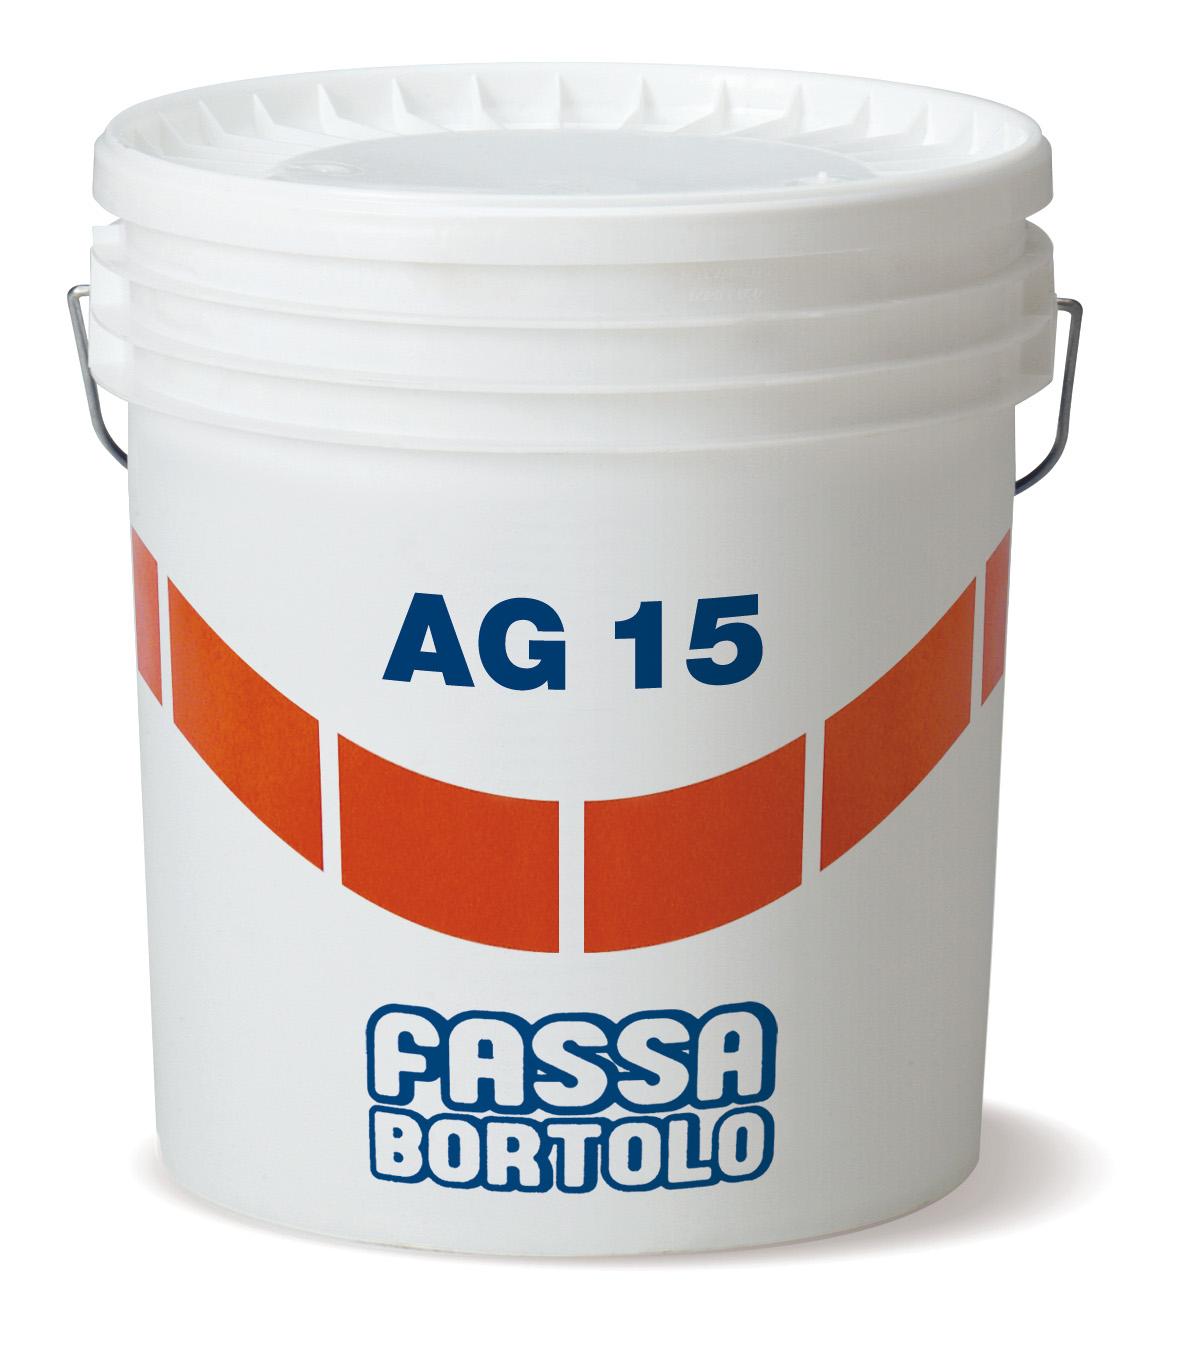 AG 15